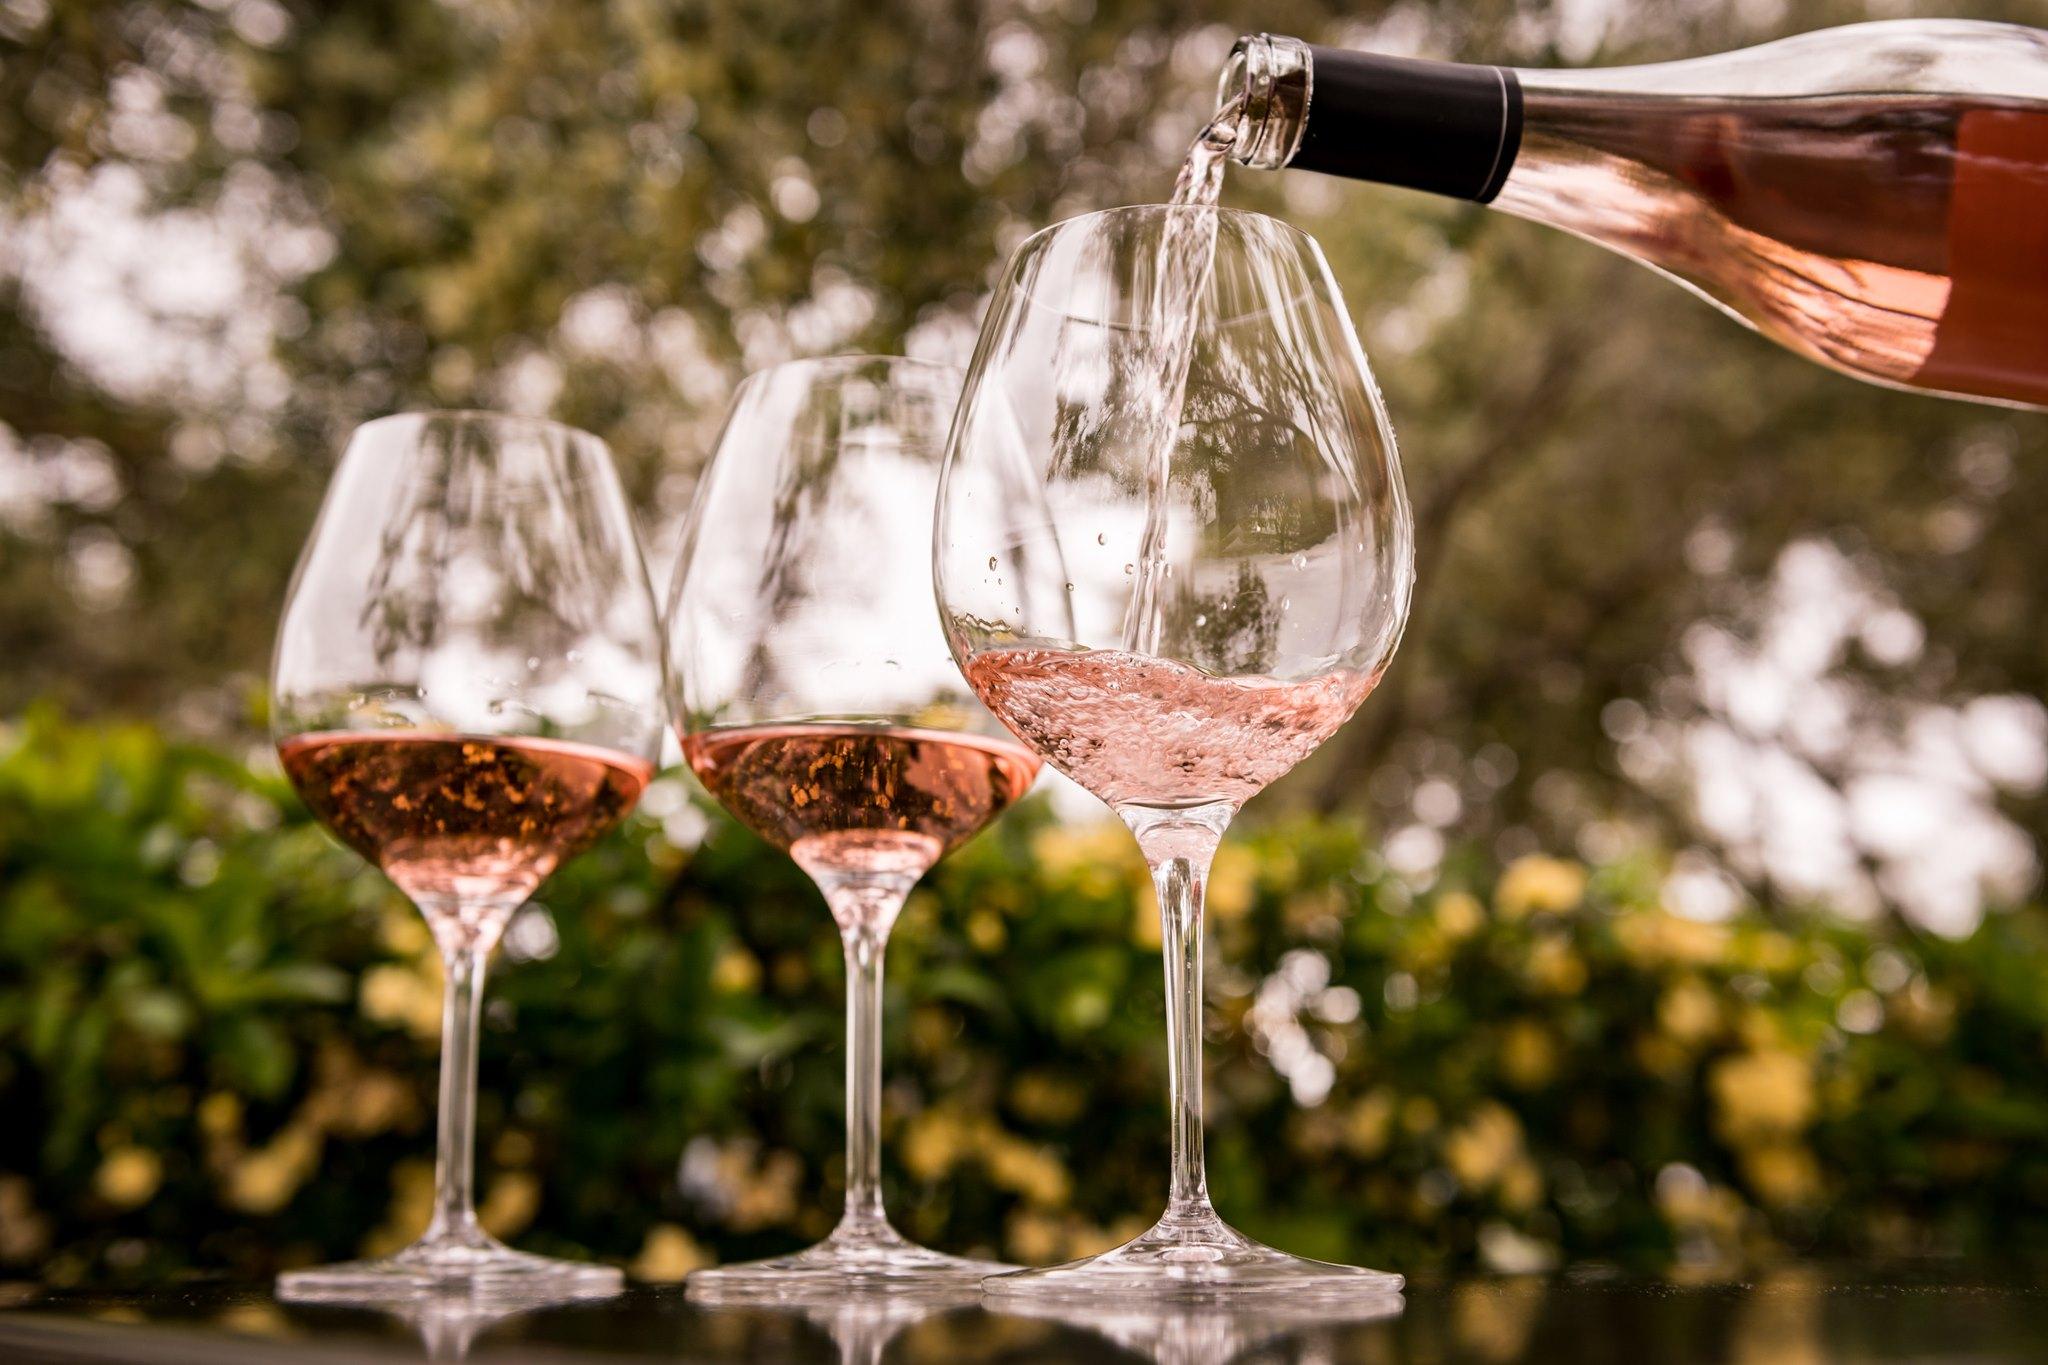 Tolosa Winery 1772 Rosé